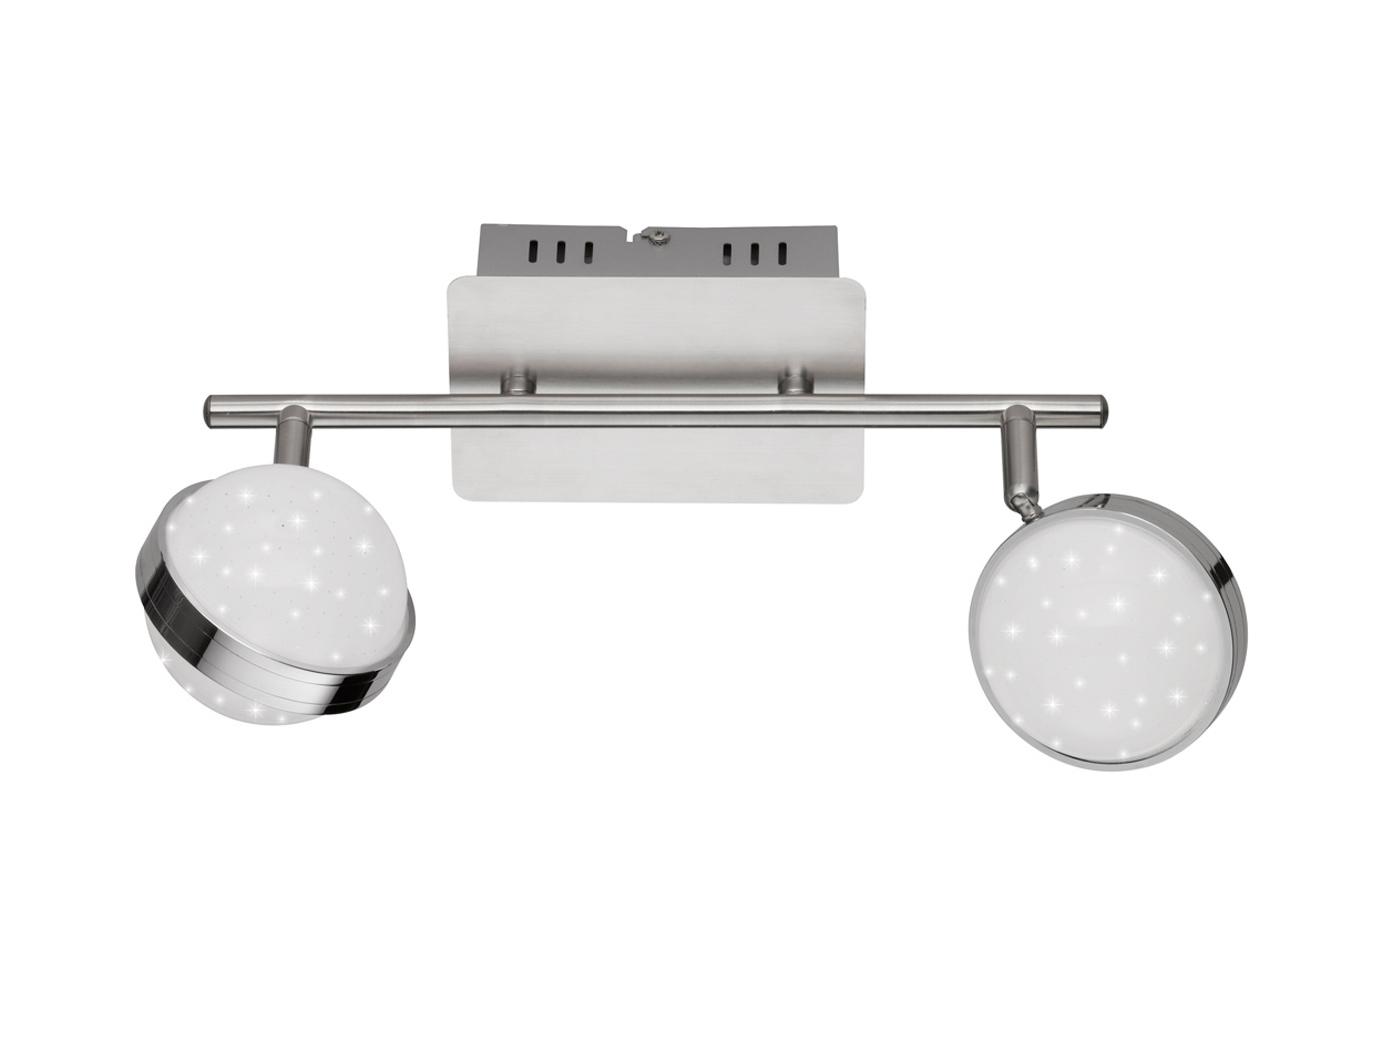 2-flammiger LED Deckenbalken MONDE, Deckenleuchten Deckenlampen LED Balken Spots